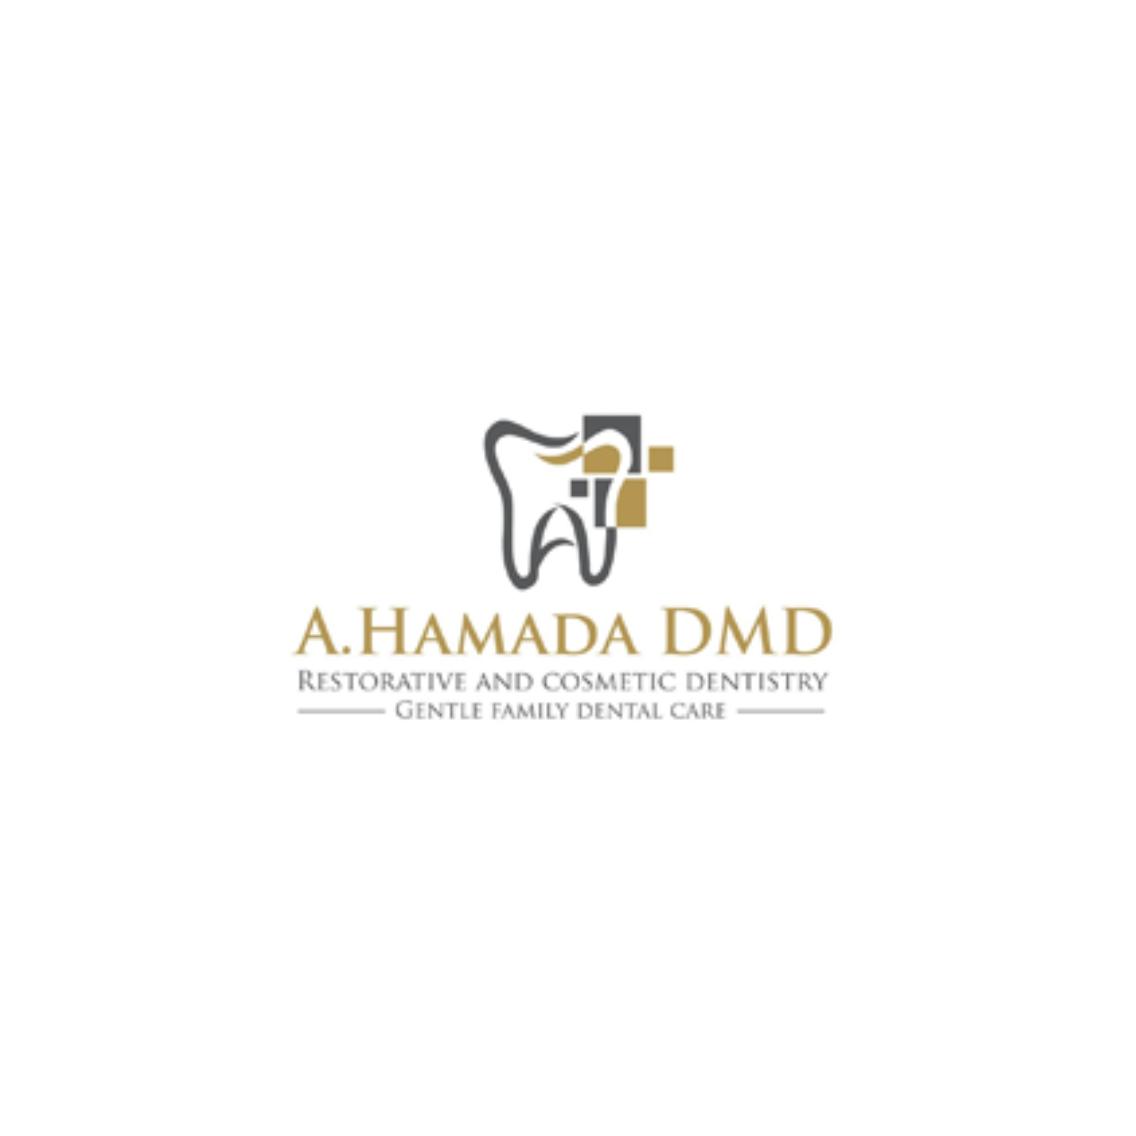 Dr. Ahmed M. Hamada, DMD